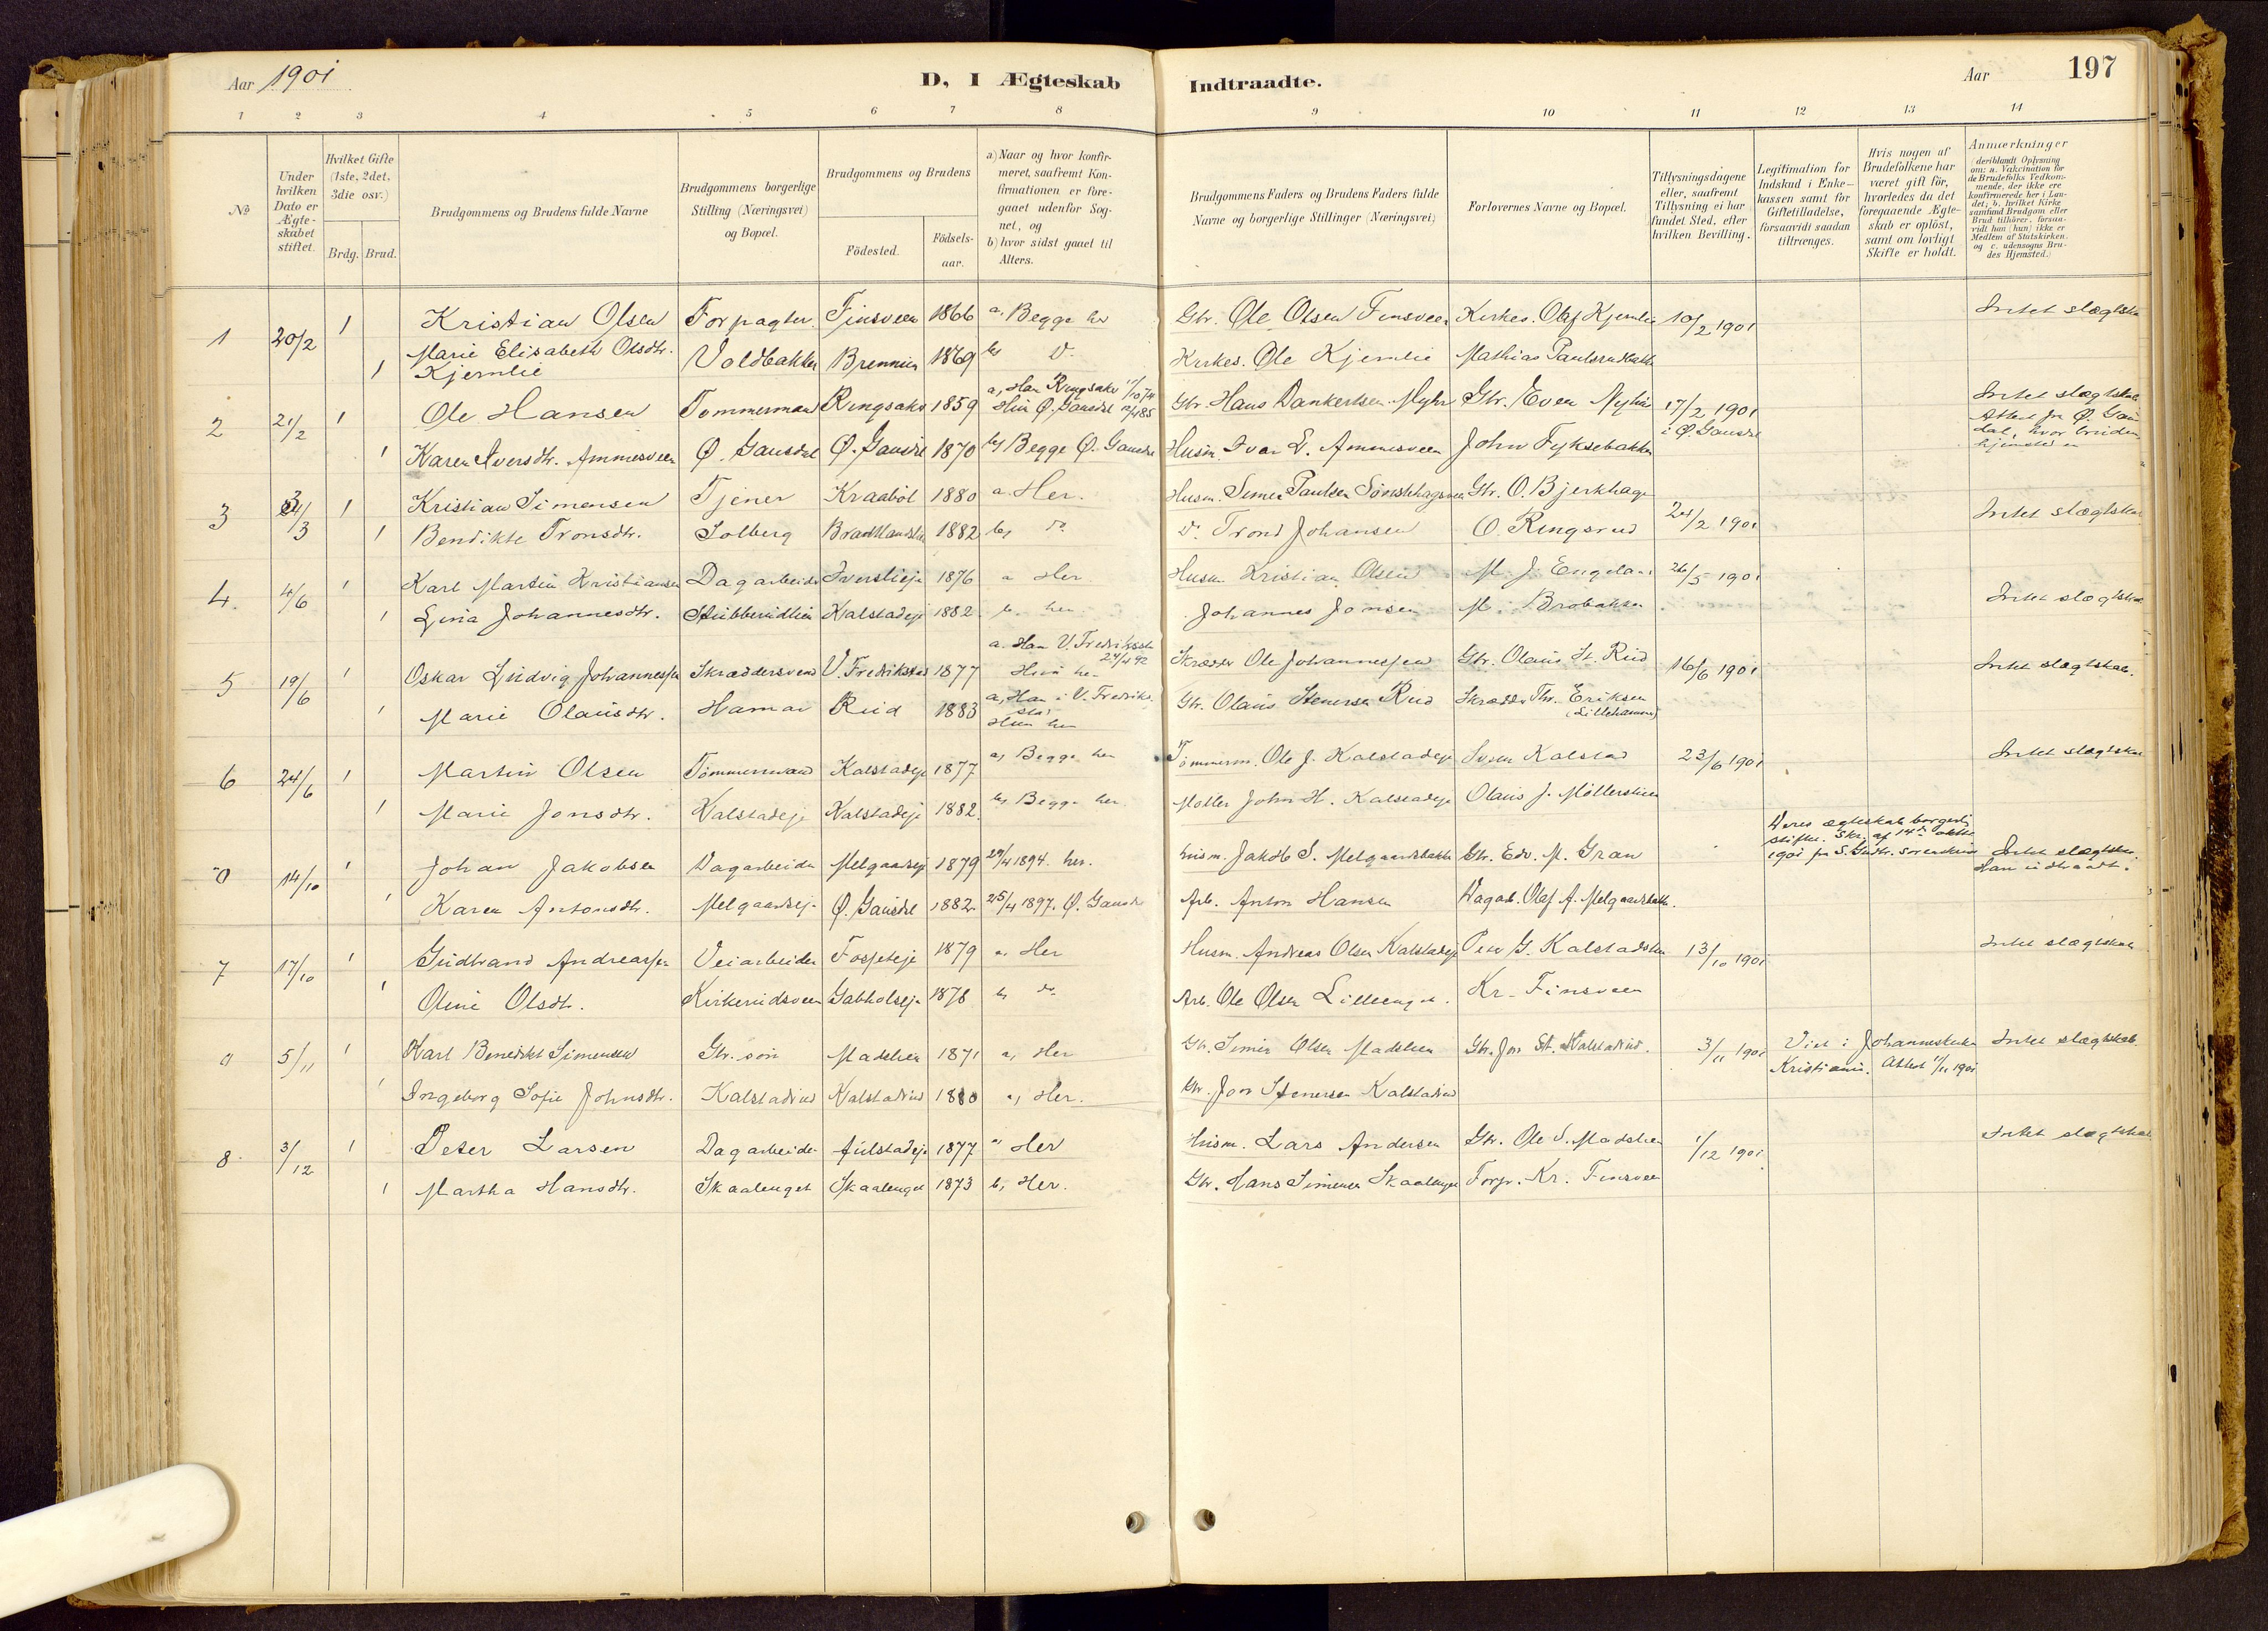 SAH, Vestre Gausdal prestekontor, Ministerialbok nr. 1, 1887-1914, s. 197